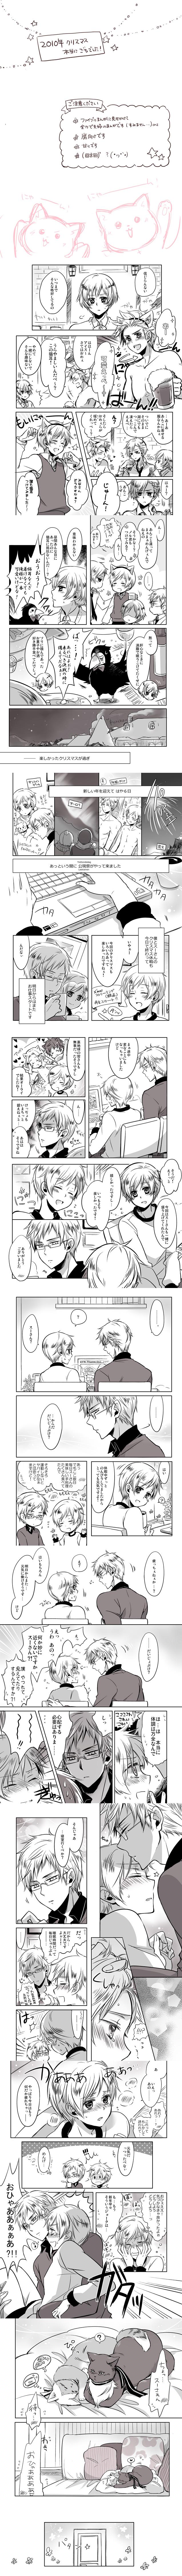 Tags: Anime, Ten(*´∀`*), Axis Powers: Hetalia, France, Swedencat, Finland, Iceland, Sweden, Norway, Mr. Puffin, Denmark, Hanatamago, Spain